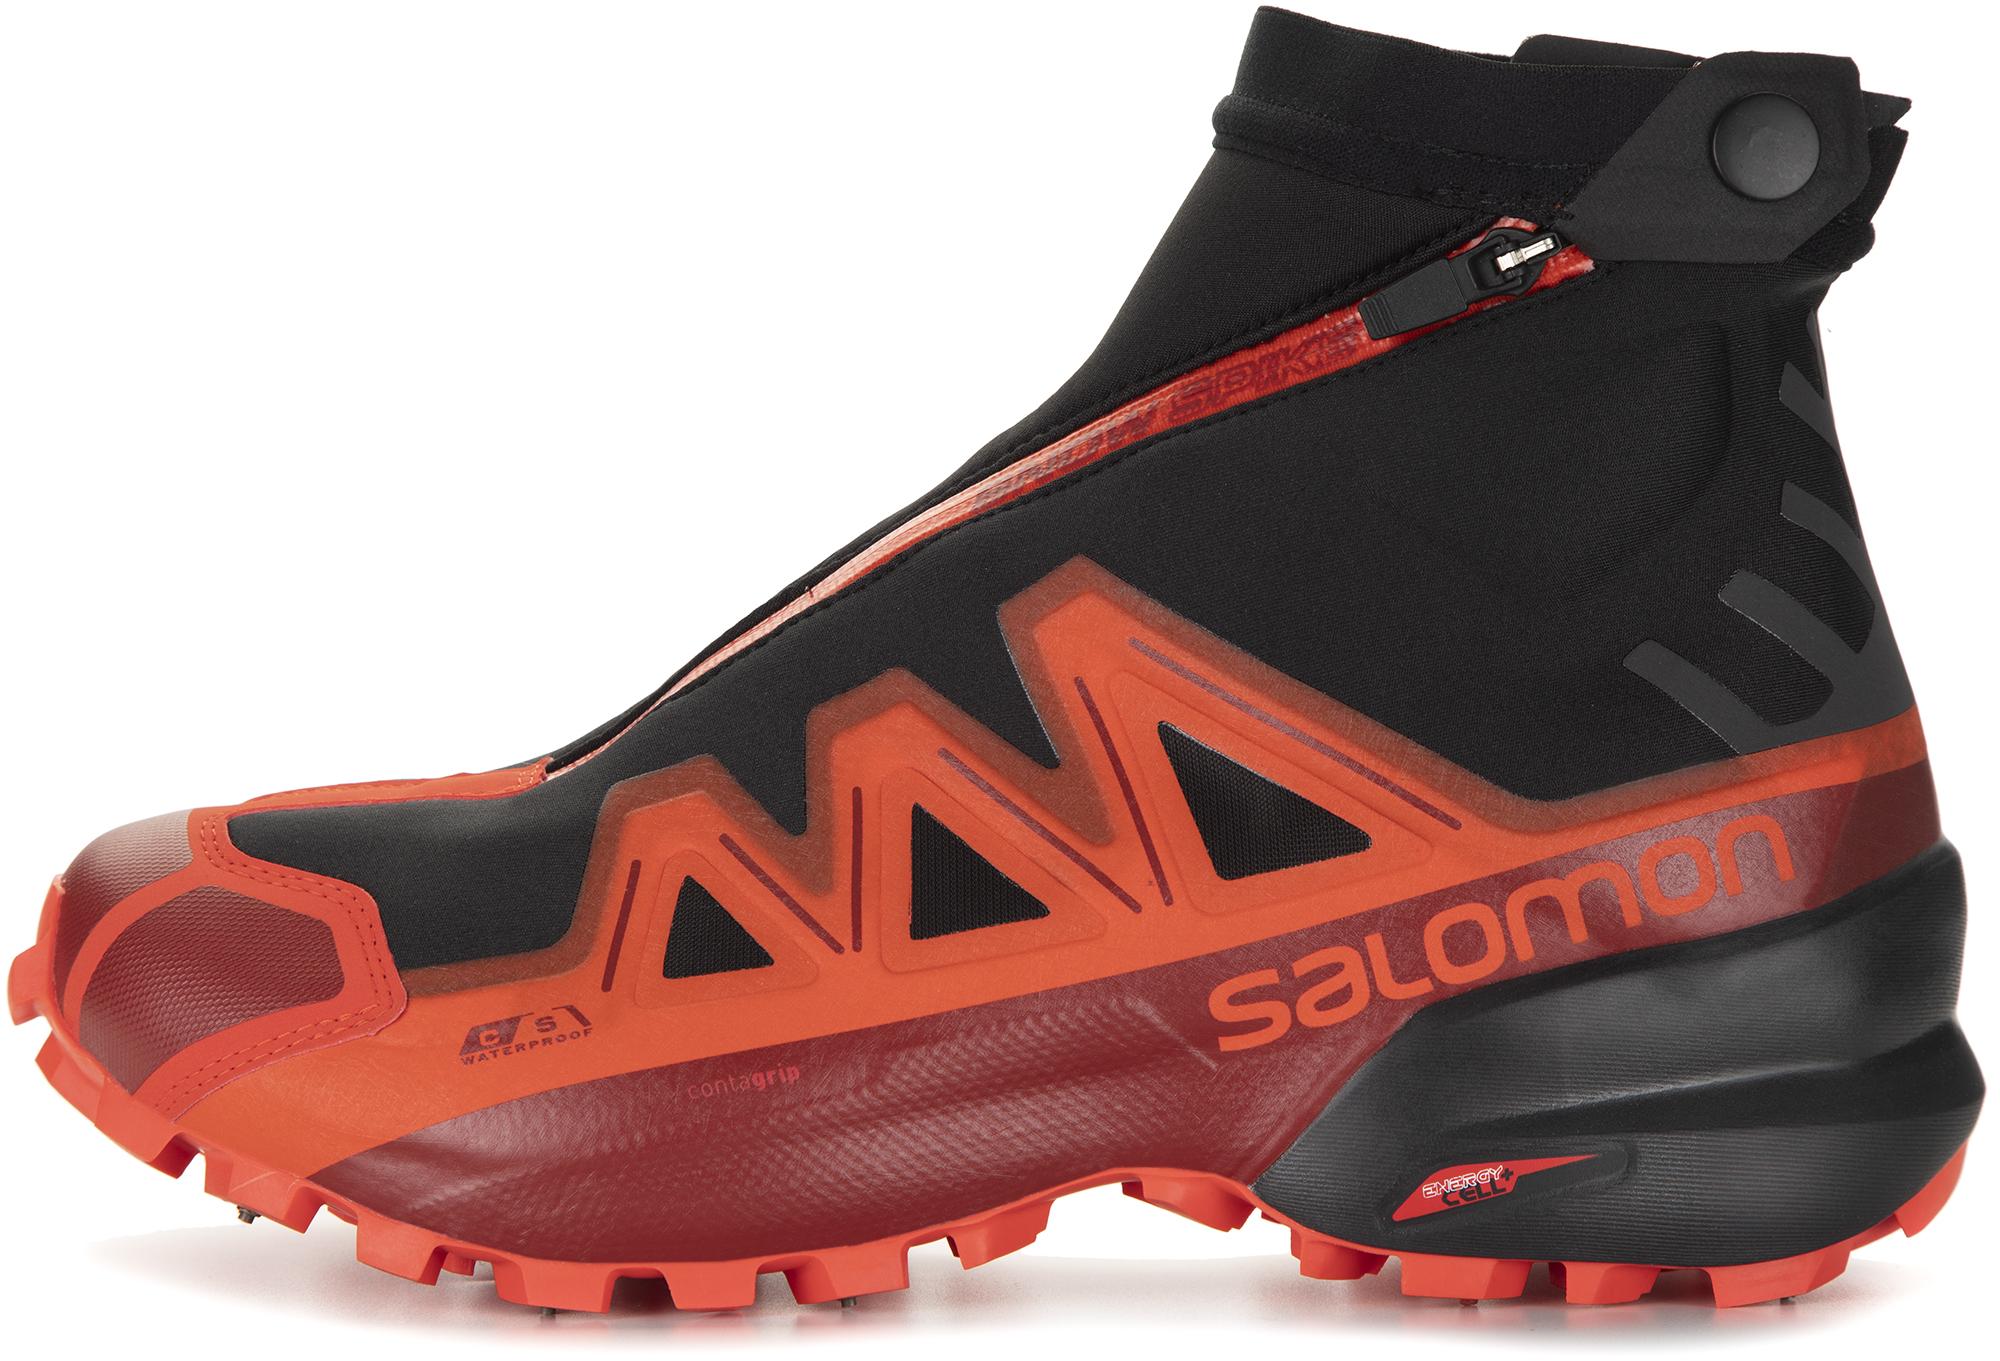 Salomon Кроссовки мужские Salomon Snowspike CSWP, размер 45 кроссовки salomon salomon sa007awbomm0